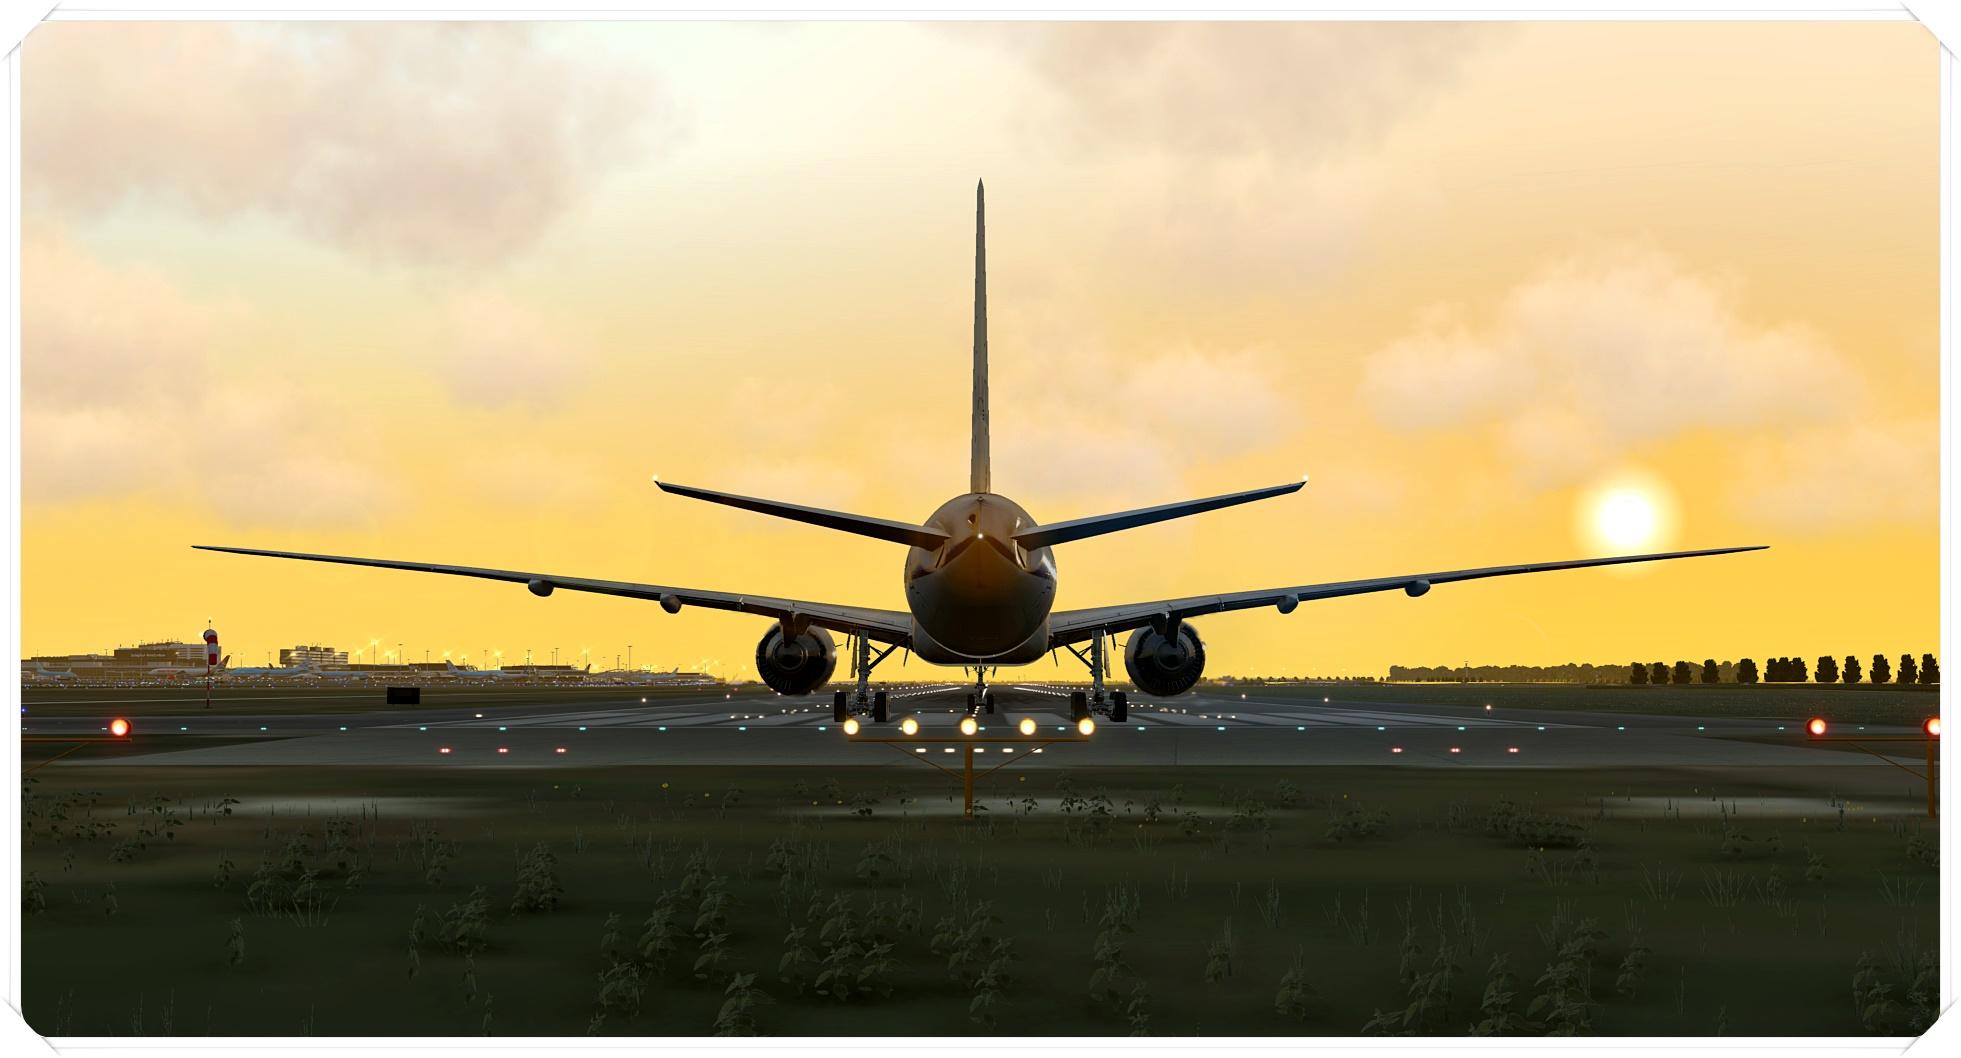 777-200lr_2mcrh8.jpg